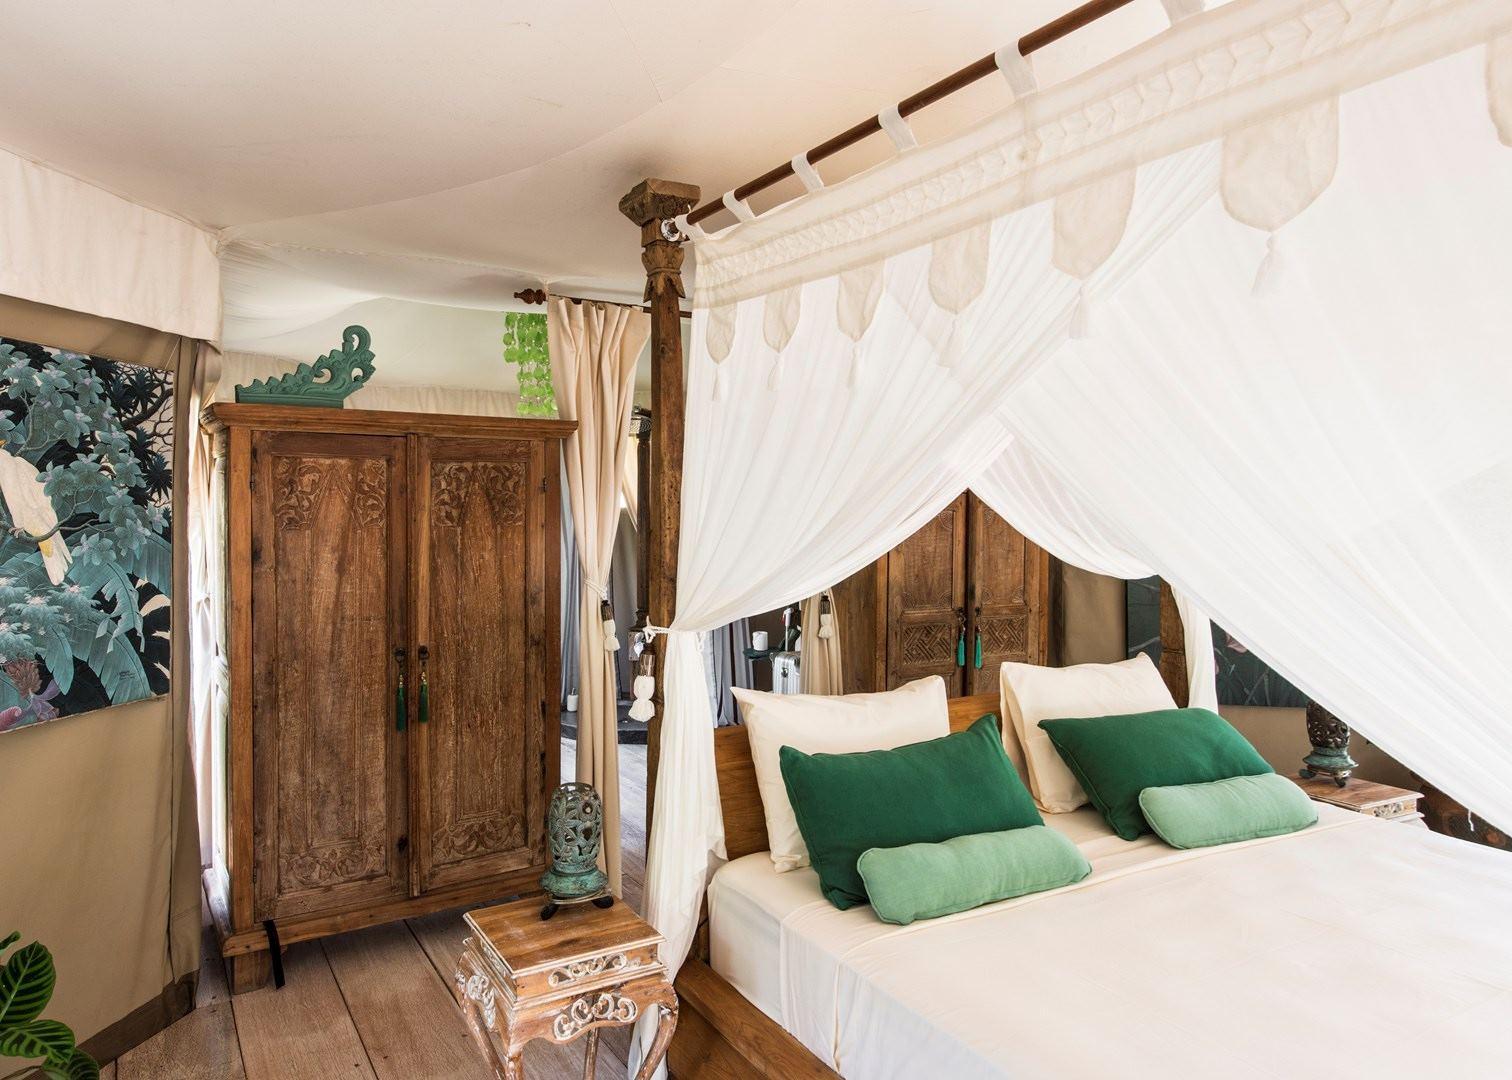 Tent Bedroom Sandat Gl&ing TentsUbud & Sandat Glamping Tents | Hotels in Ubud | Audley Travel